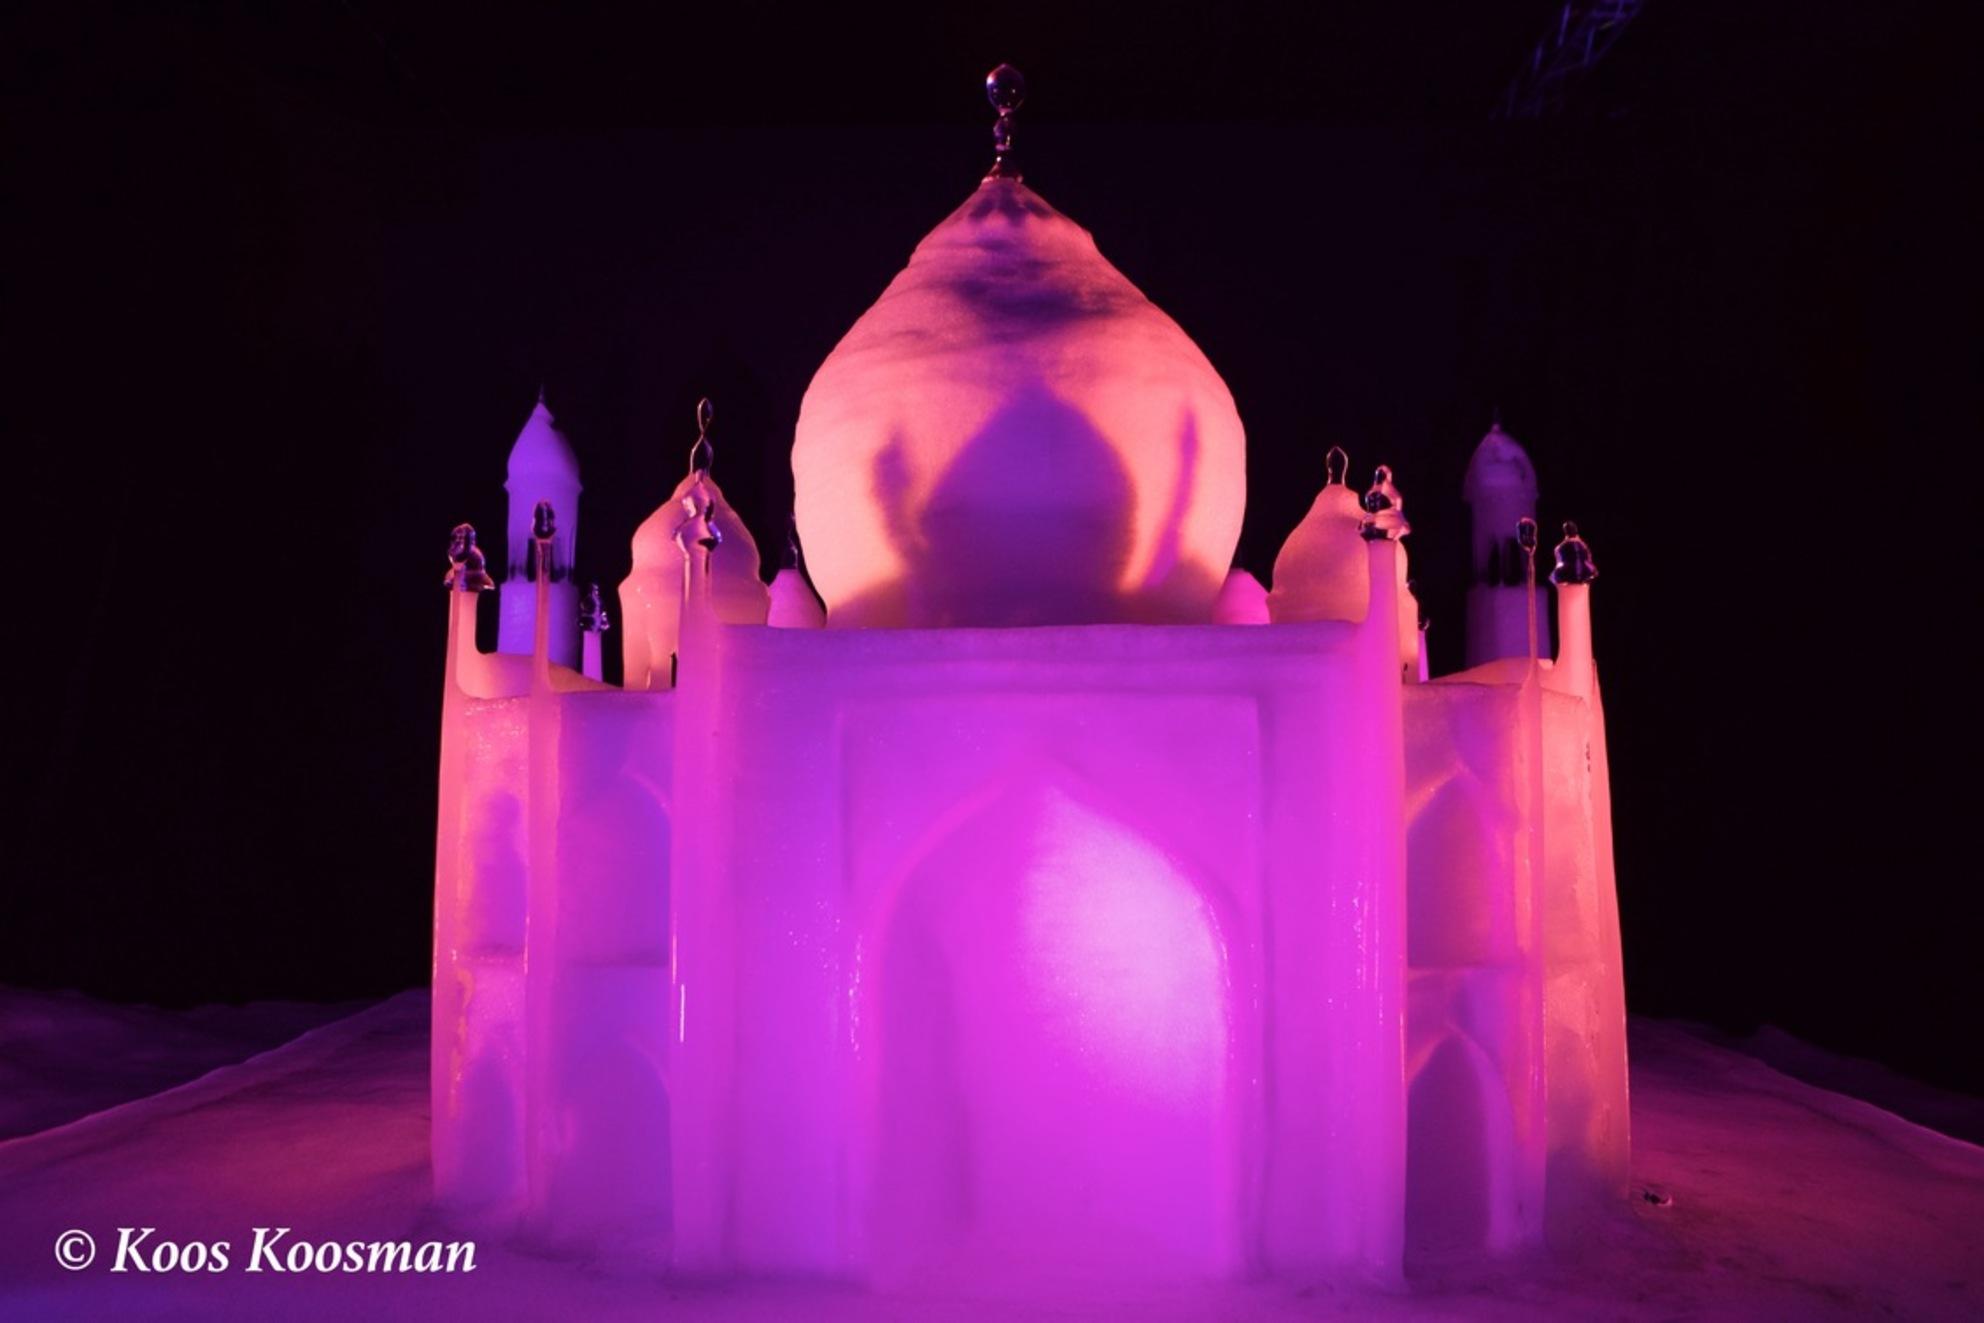 Bevroren Taj Mahal - - - foto door Koosman op 27-03-2016 - deze foto bevat: oud, kasteel, architectuur, gebouw, nacht, paleis, india, keizer, hindoeisme, indusvallei, sindu, 1631, mumtaz mahal, shahjahan